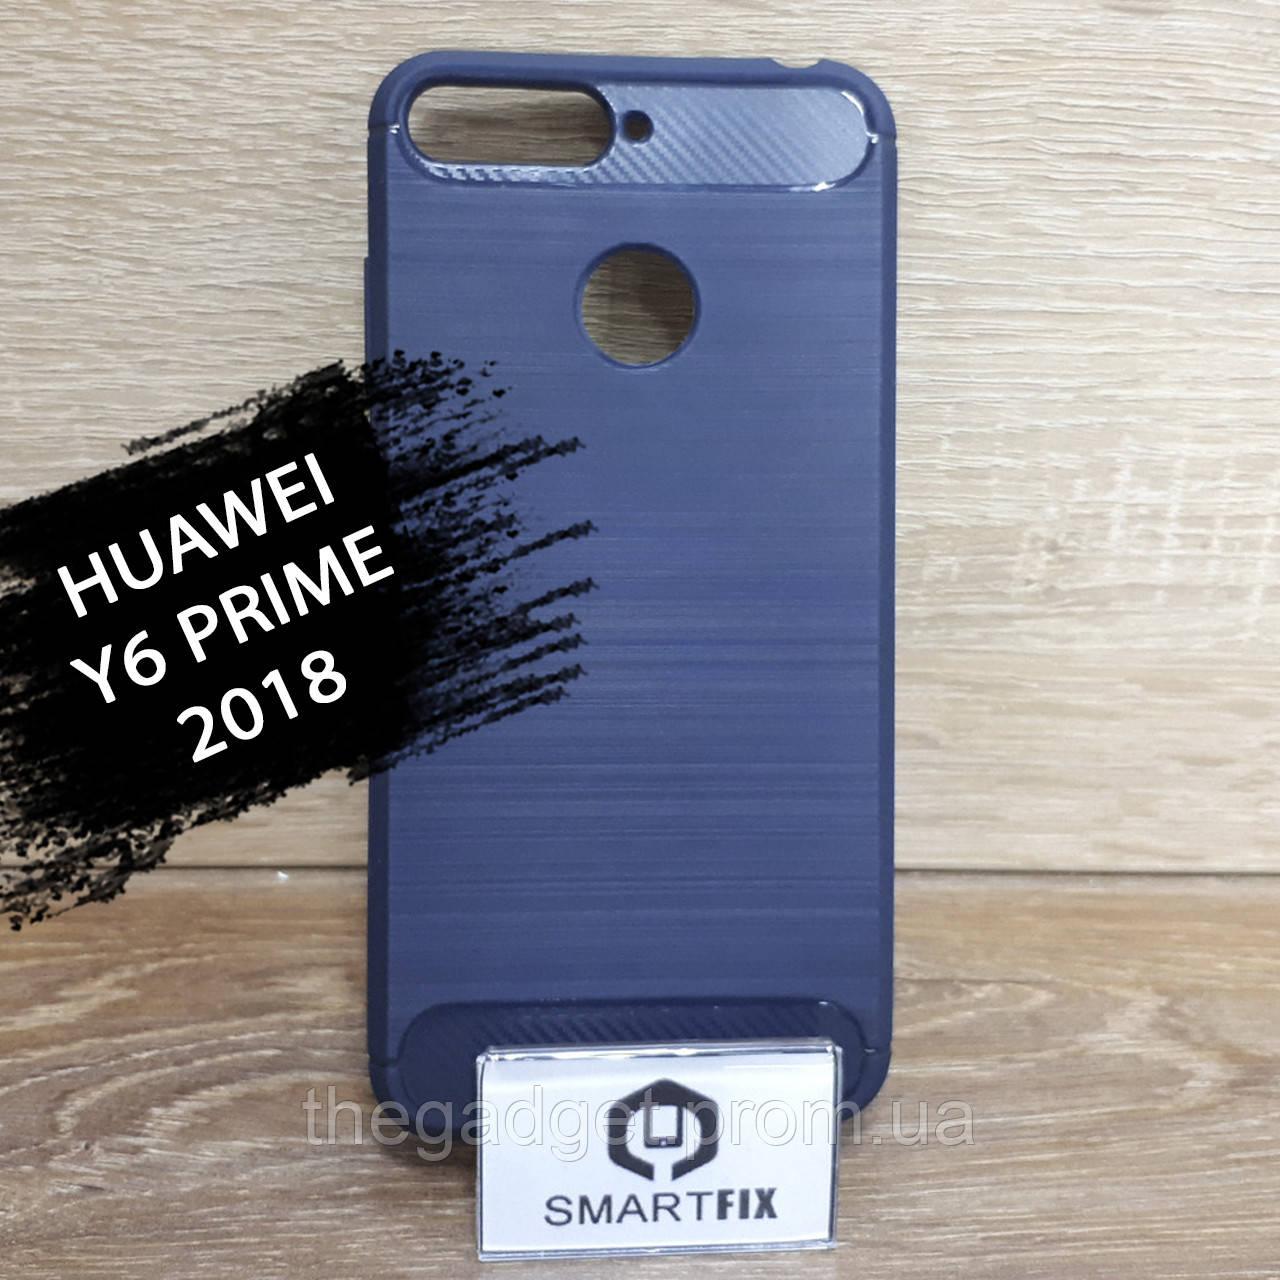 Противоударный чехол для Huawei Y6 Prime (2018) (ATU-L31) Ultimate